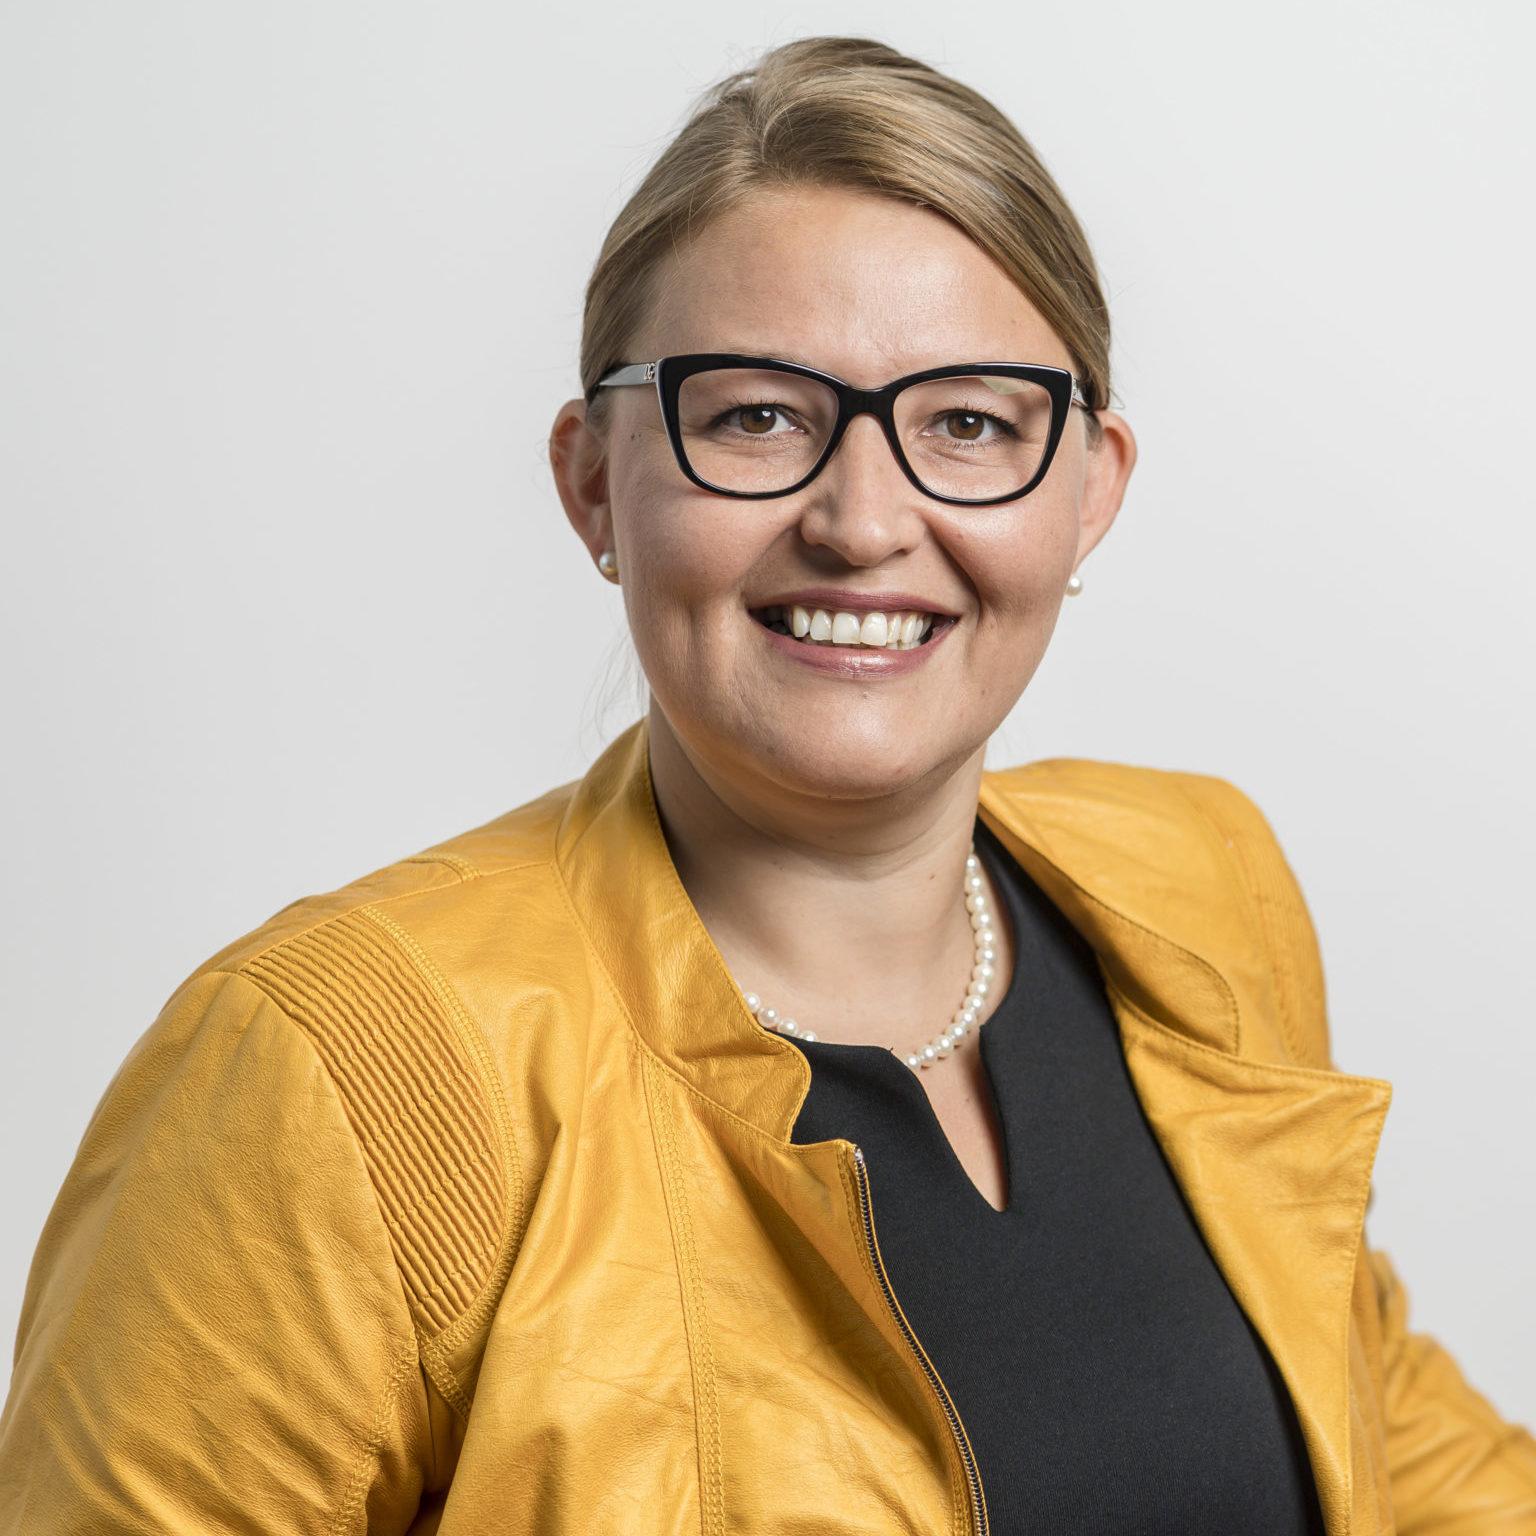 Christine Mutenthaler